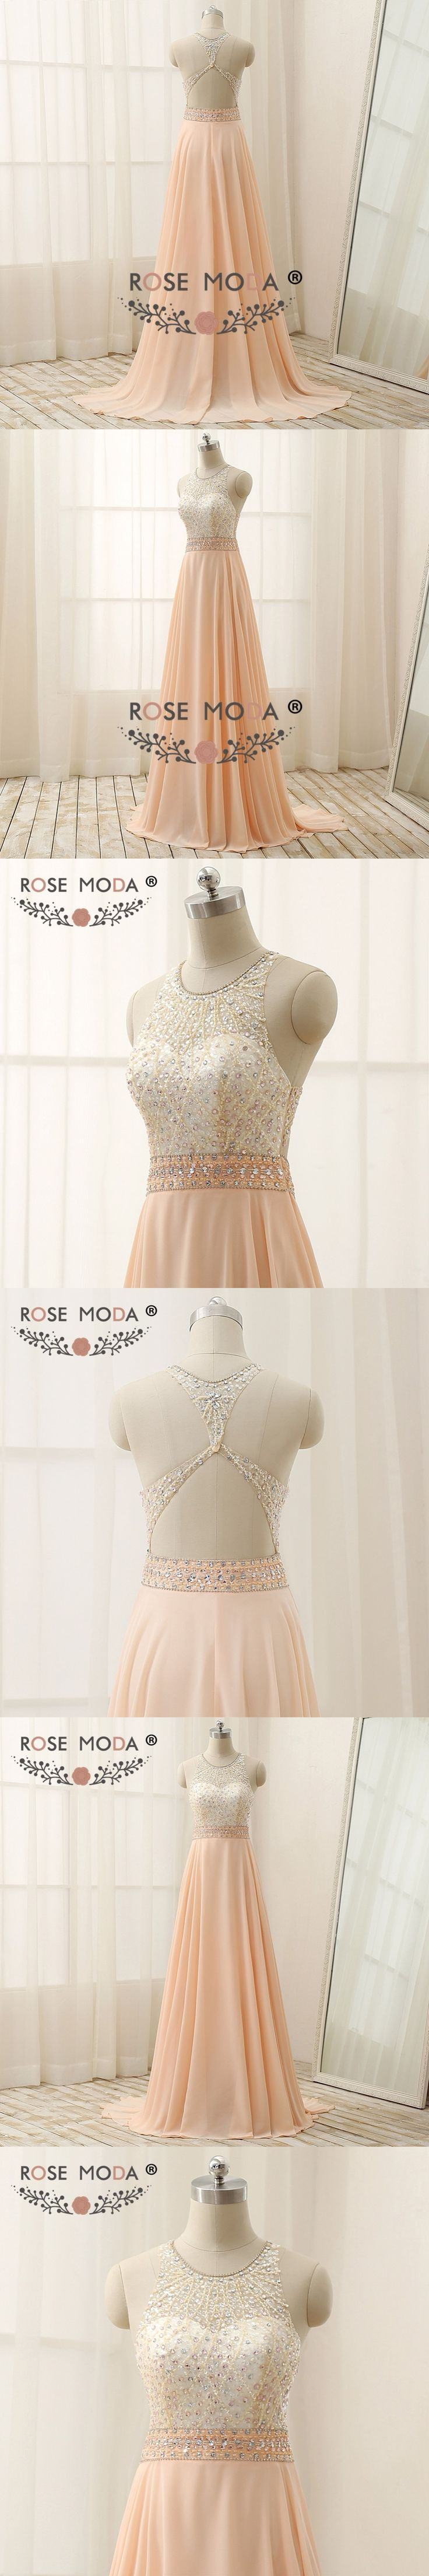 Rose Moda High Neck Peach Evening Dress Floor Length Hand Crystal Beaded Cut Out Back Formal Xmas Party Dress 2018